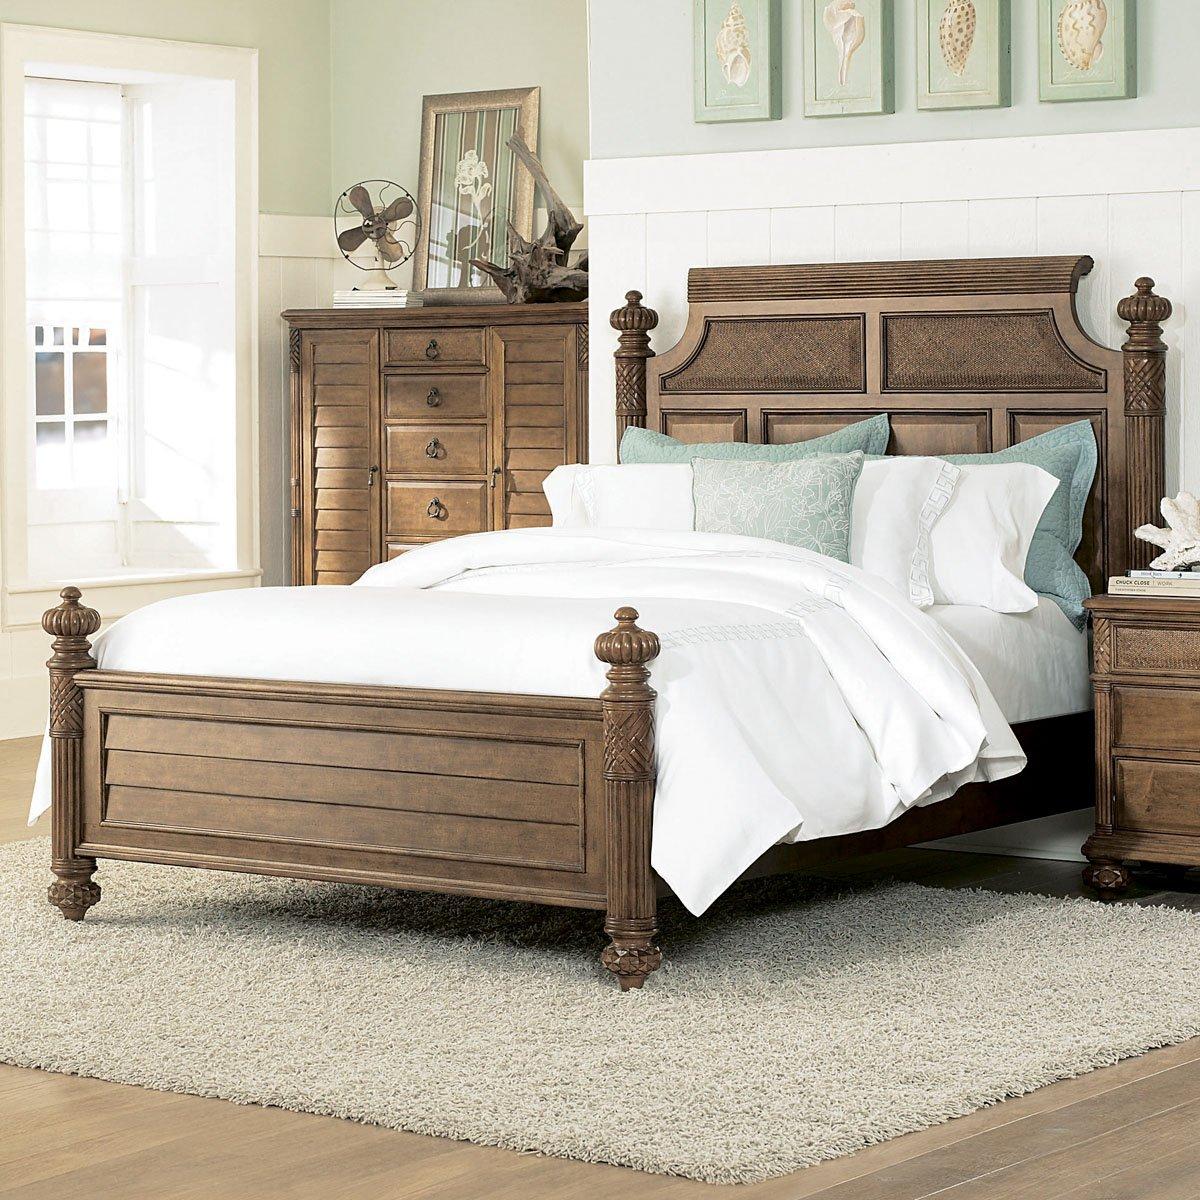 Amazon.com: American Drew Grand Isle Island Panel Bed in Amber ...